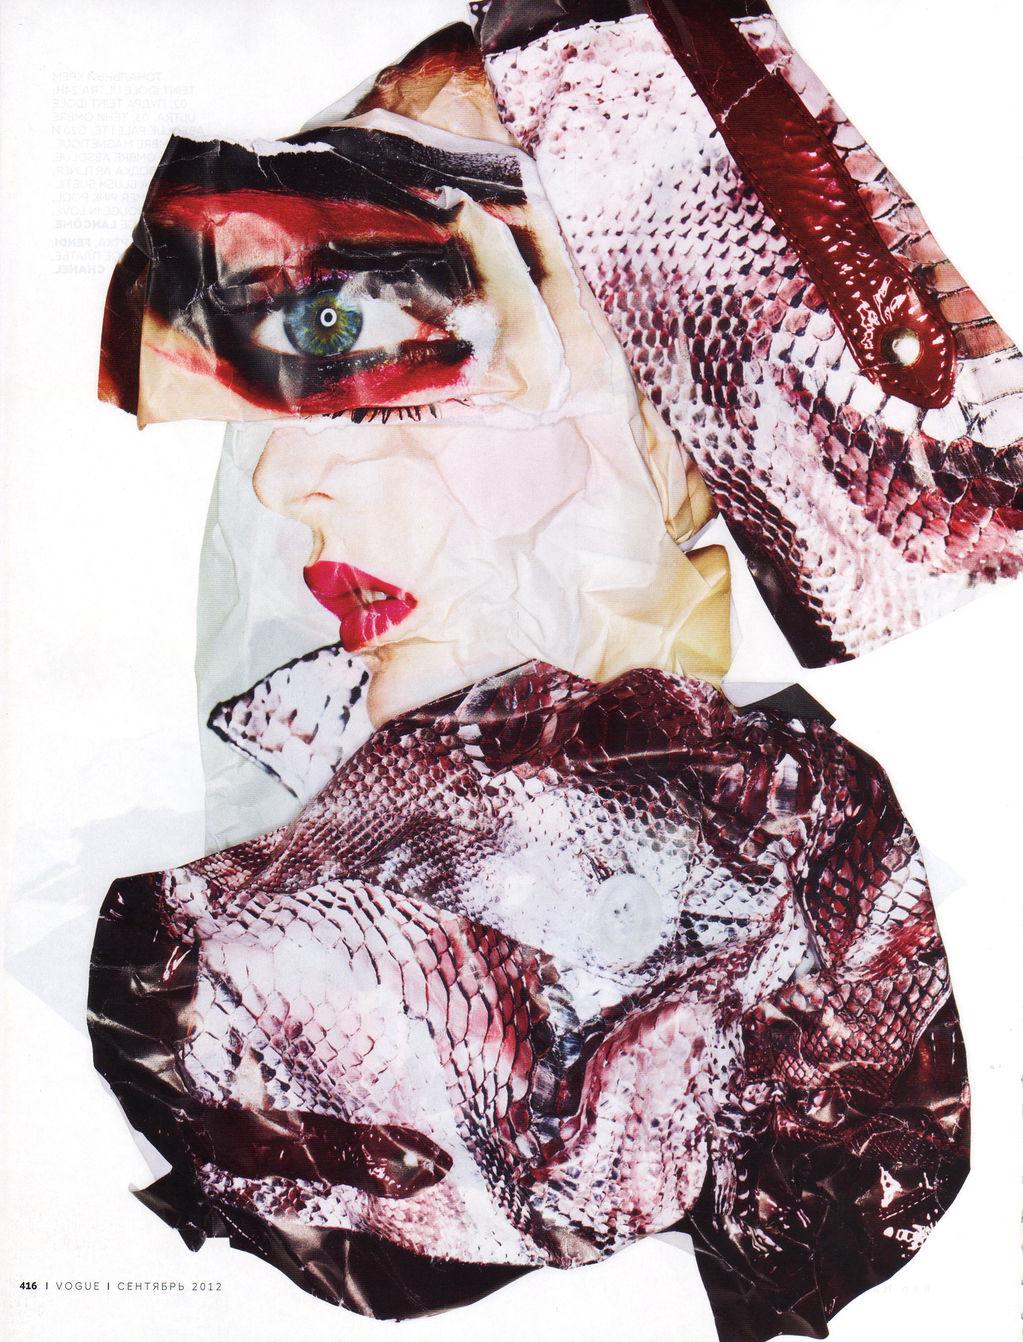 Codie Young + Natasha Royt + Sil Bruinsma + Ben Hassett + Vogue Russia